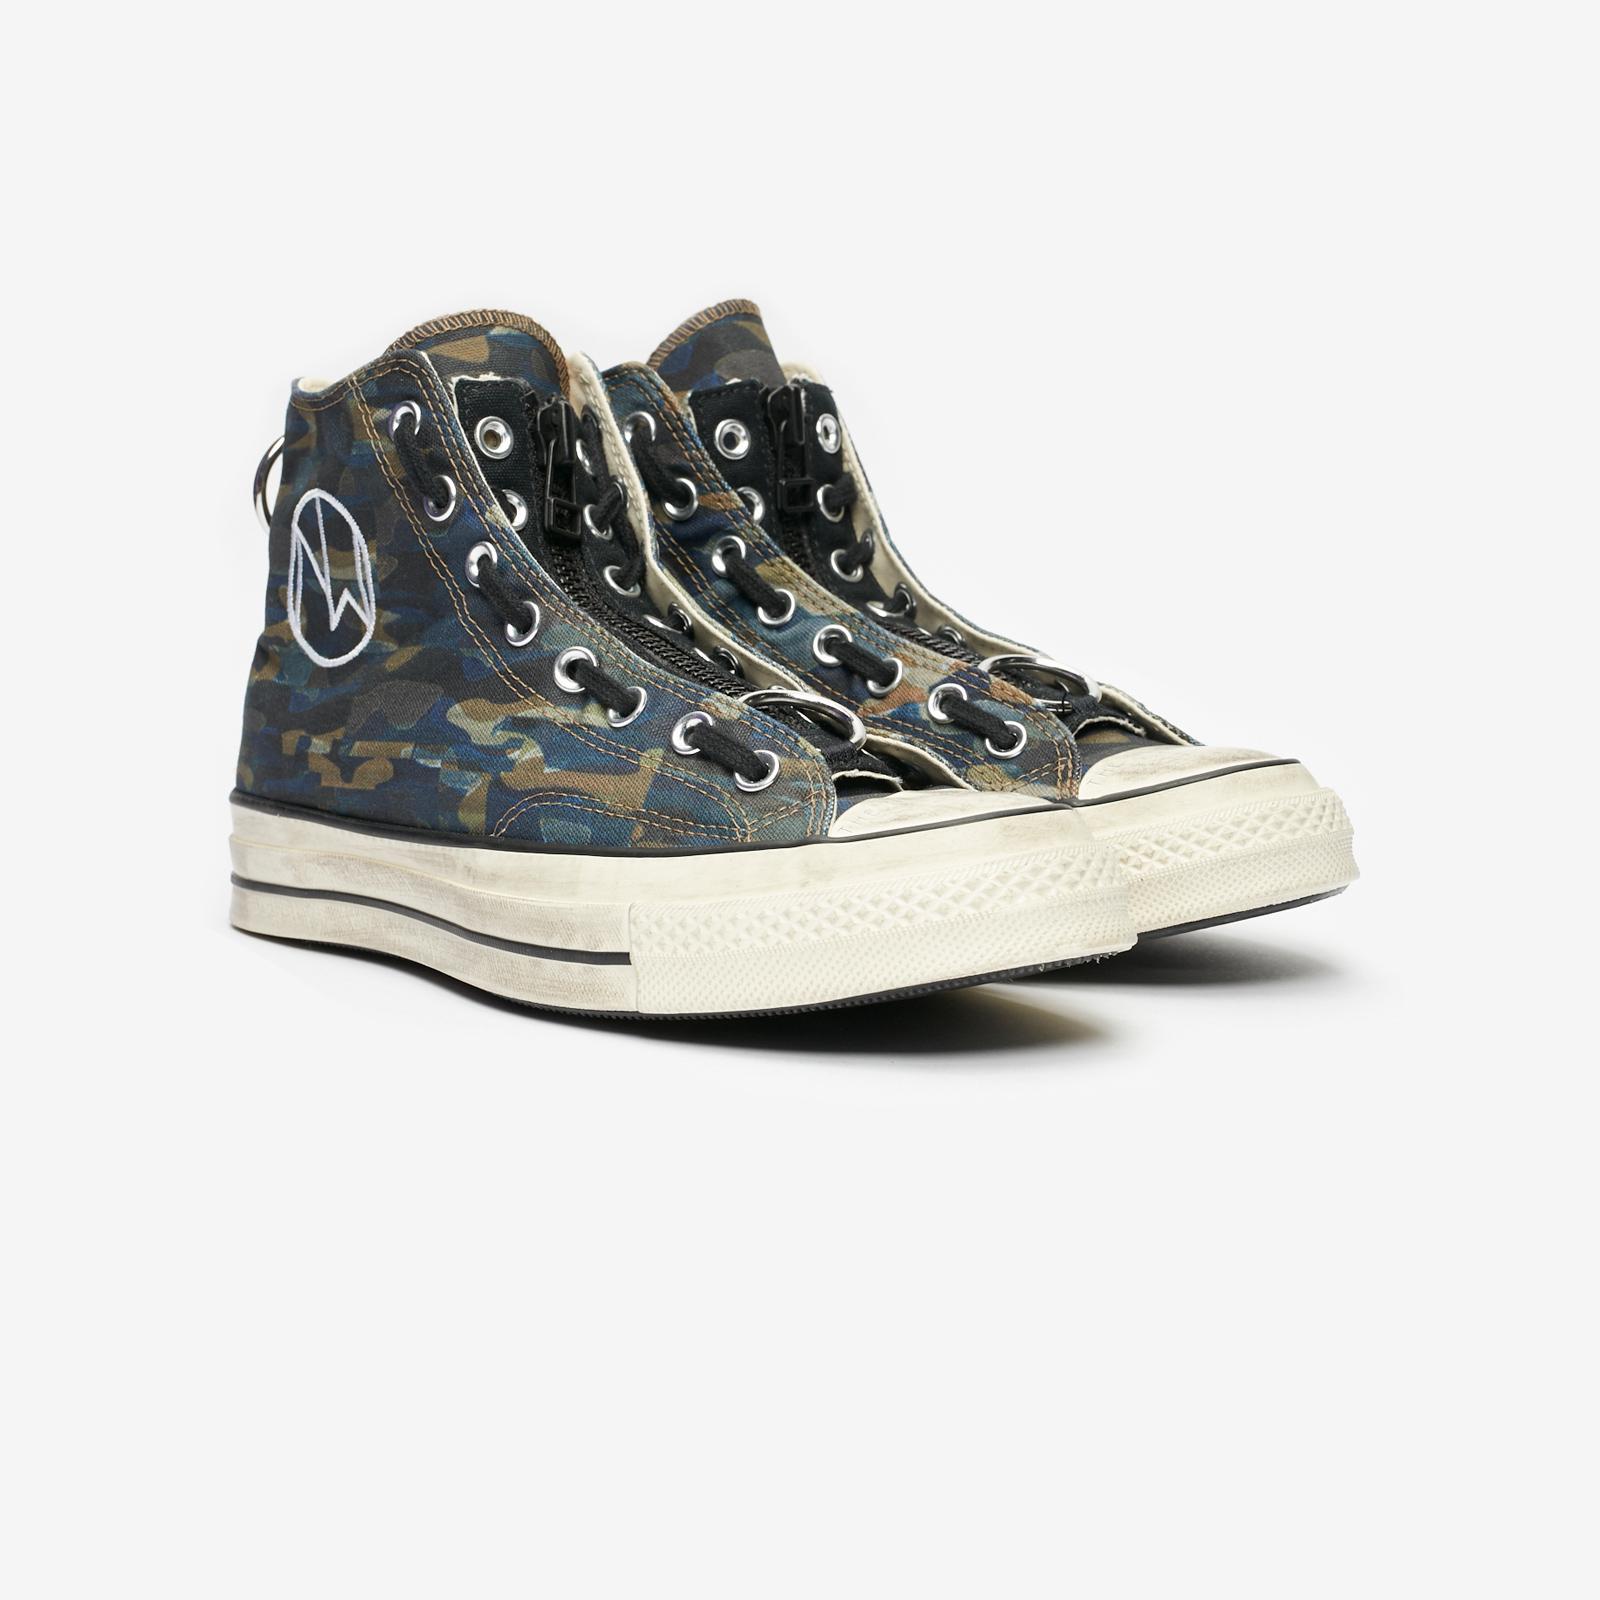 Jajaja Realmente Cortés  Converse Chuck 70 Hi x Undercover - 164833c - Sneakersnstuff | sneakers &  streetwear online since 1999